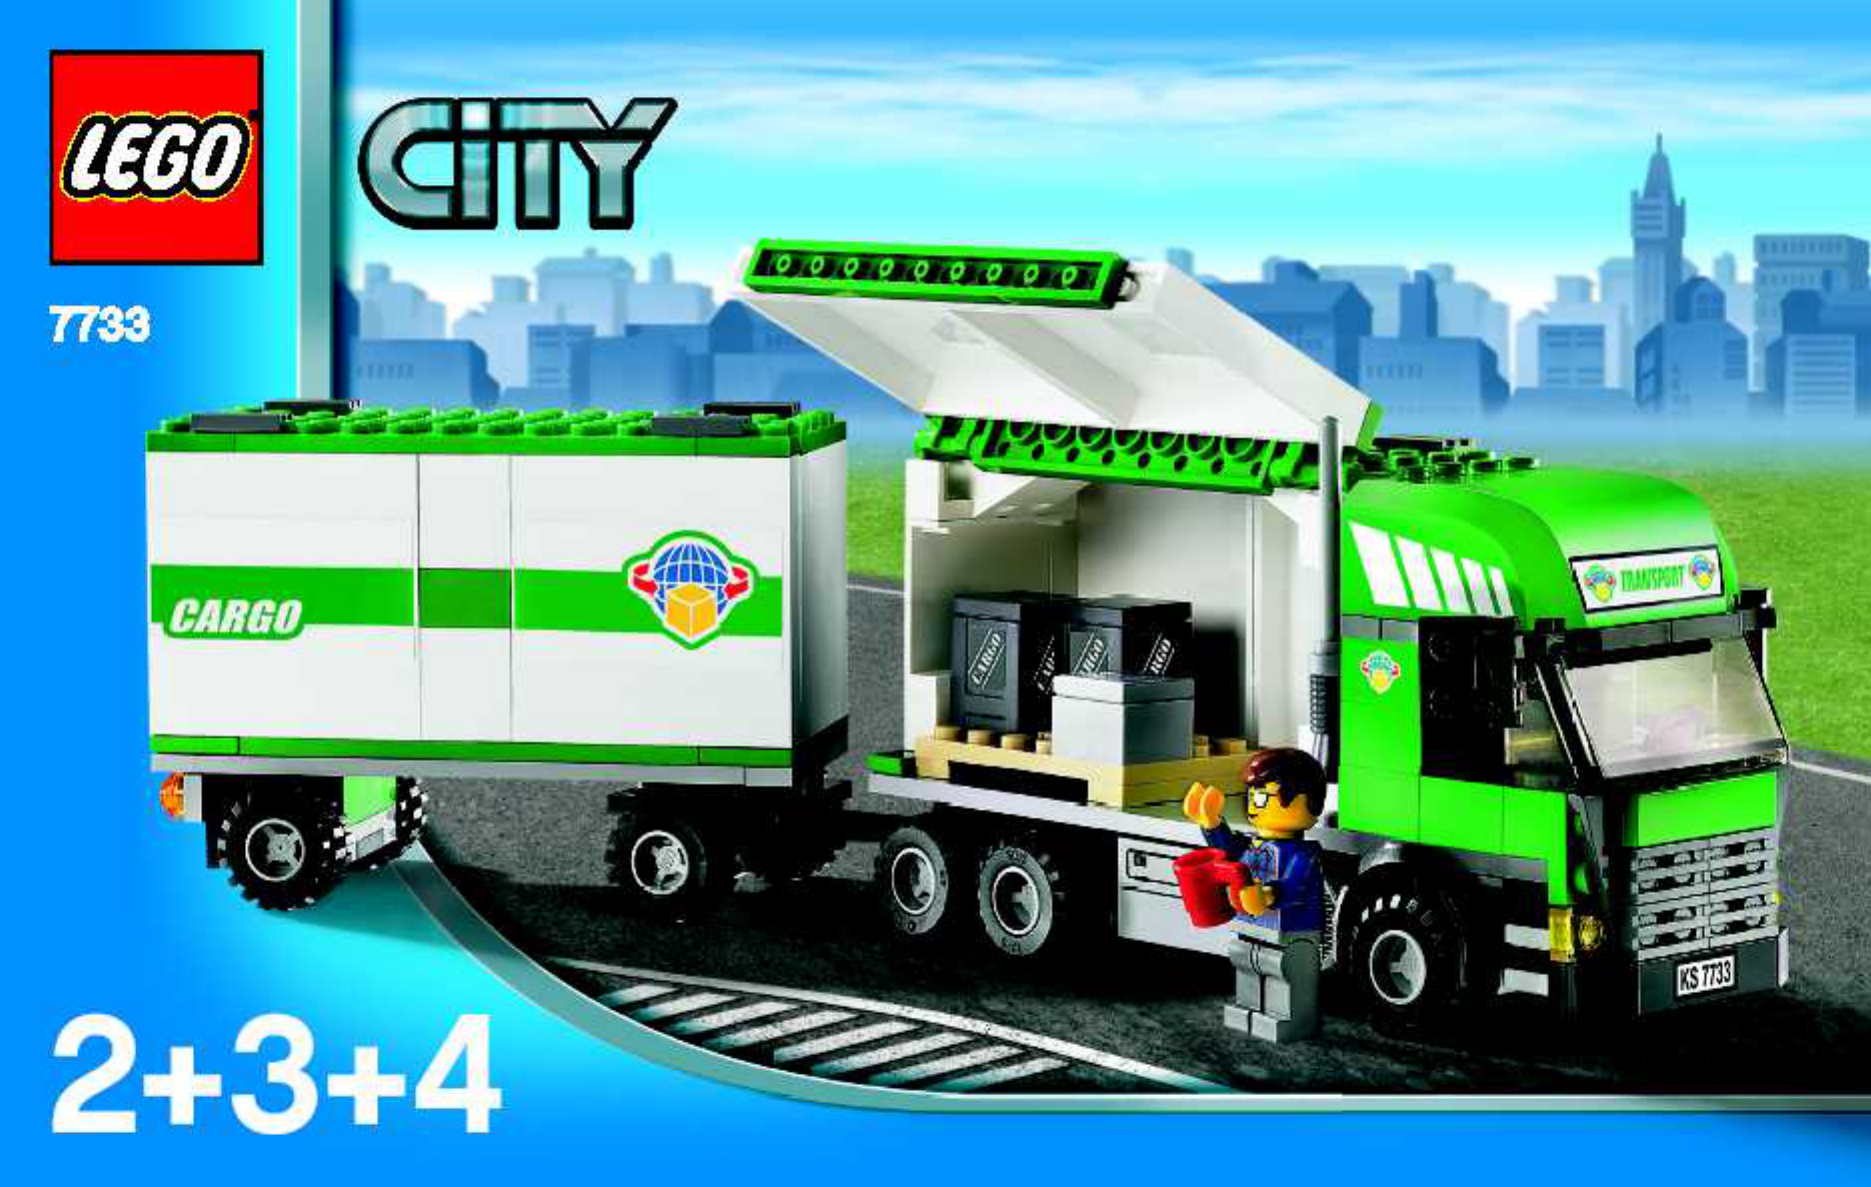 handleiding lego lego city cargo truck forklift 77332